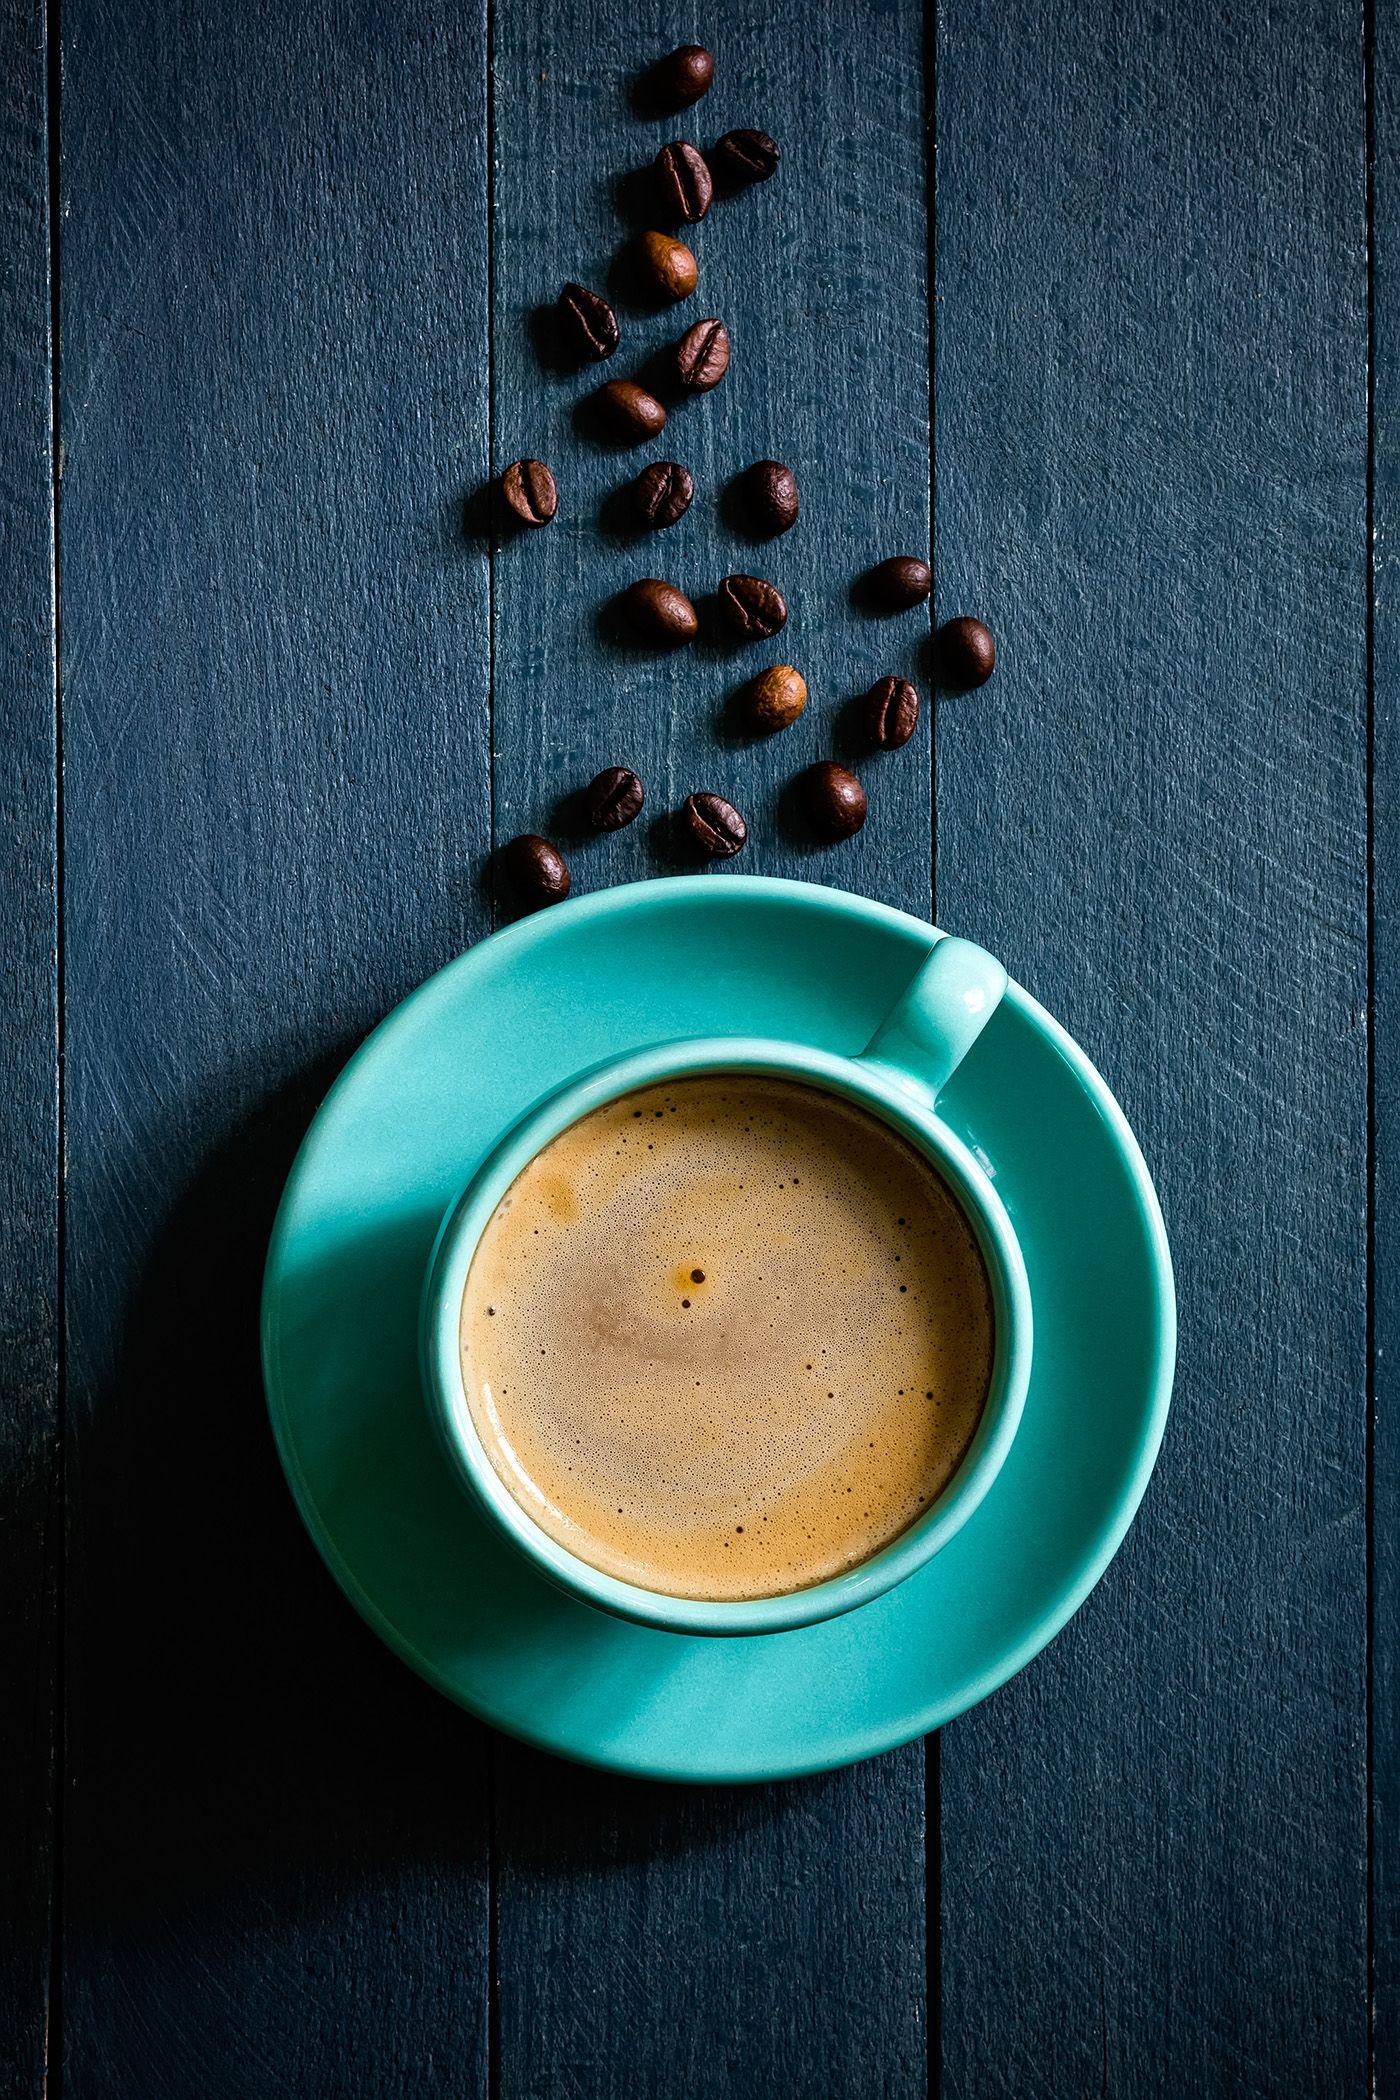 Обои coffee beans, coffee, wood, кофе, чашки, кофейные зёрна. Еда foto 18